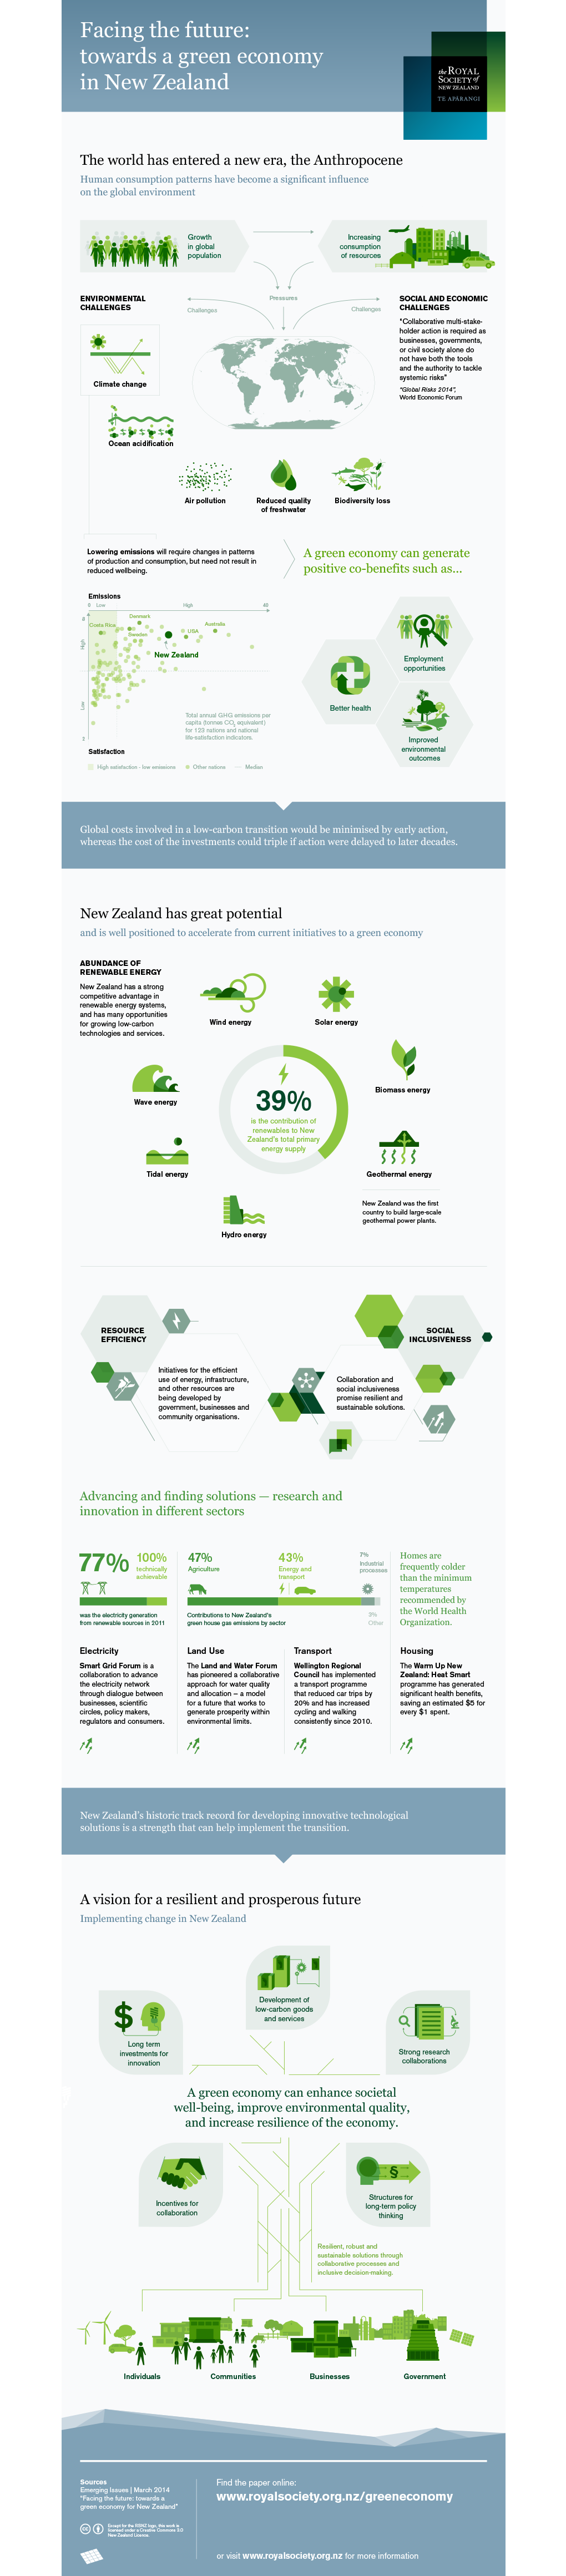 Dmprk RSNZ Green Economy 02